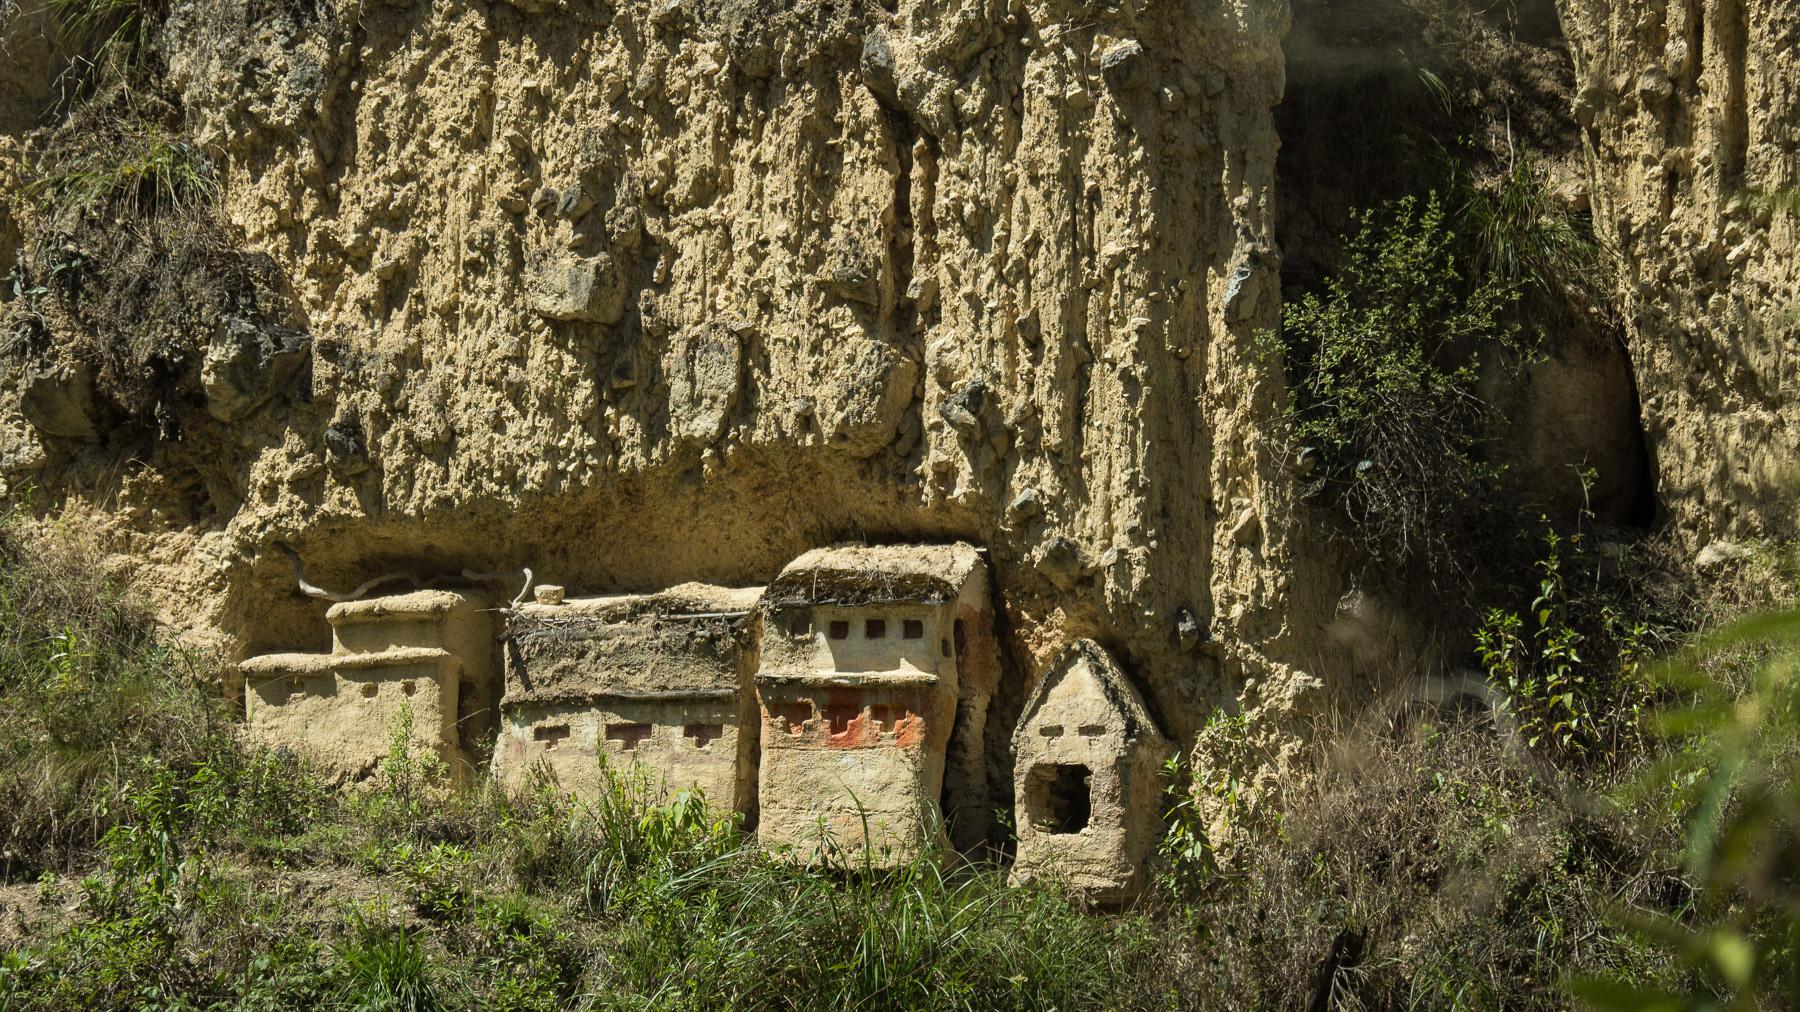 Grabstätten in den Felsen irgendwo auf dem Weg